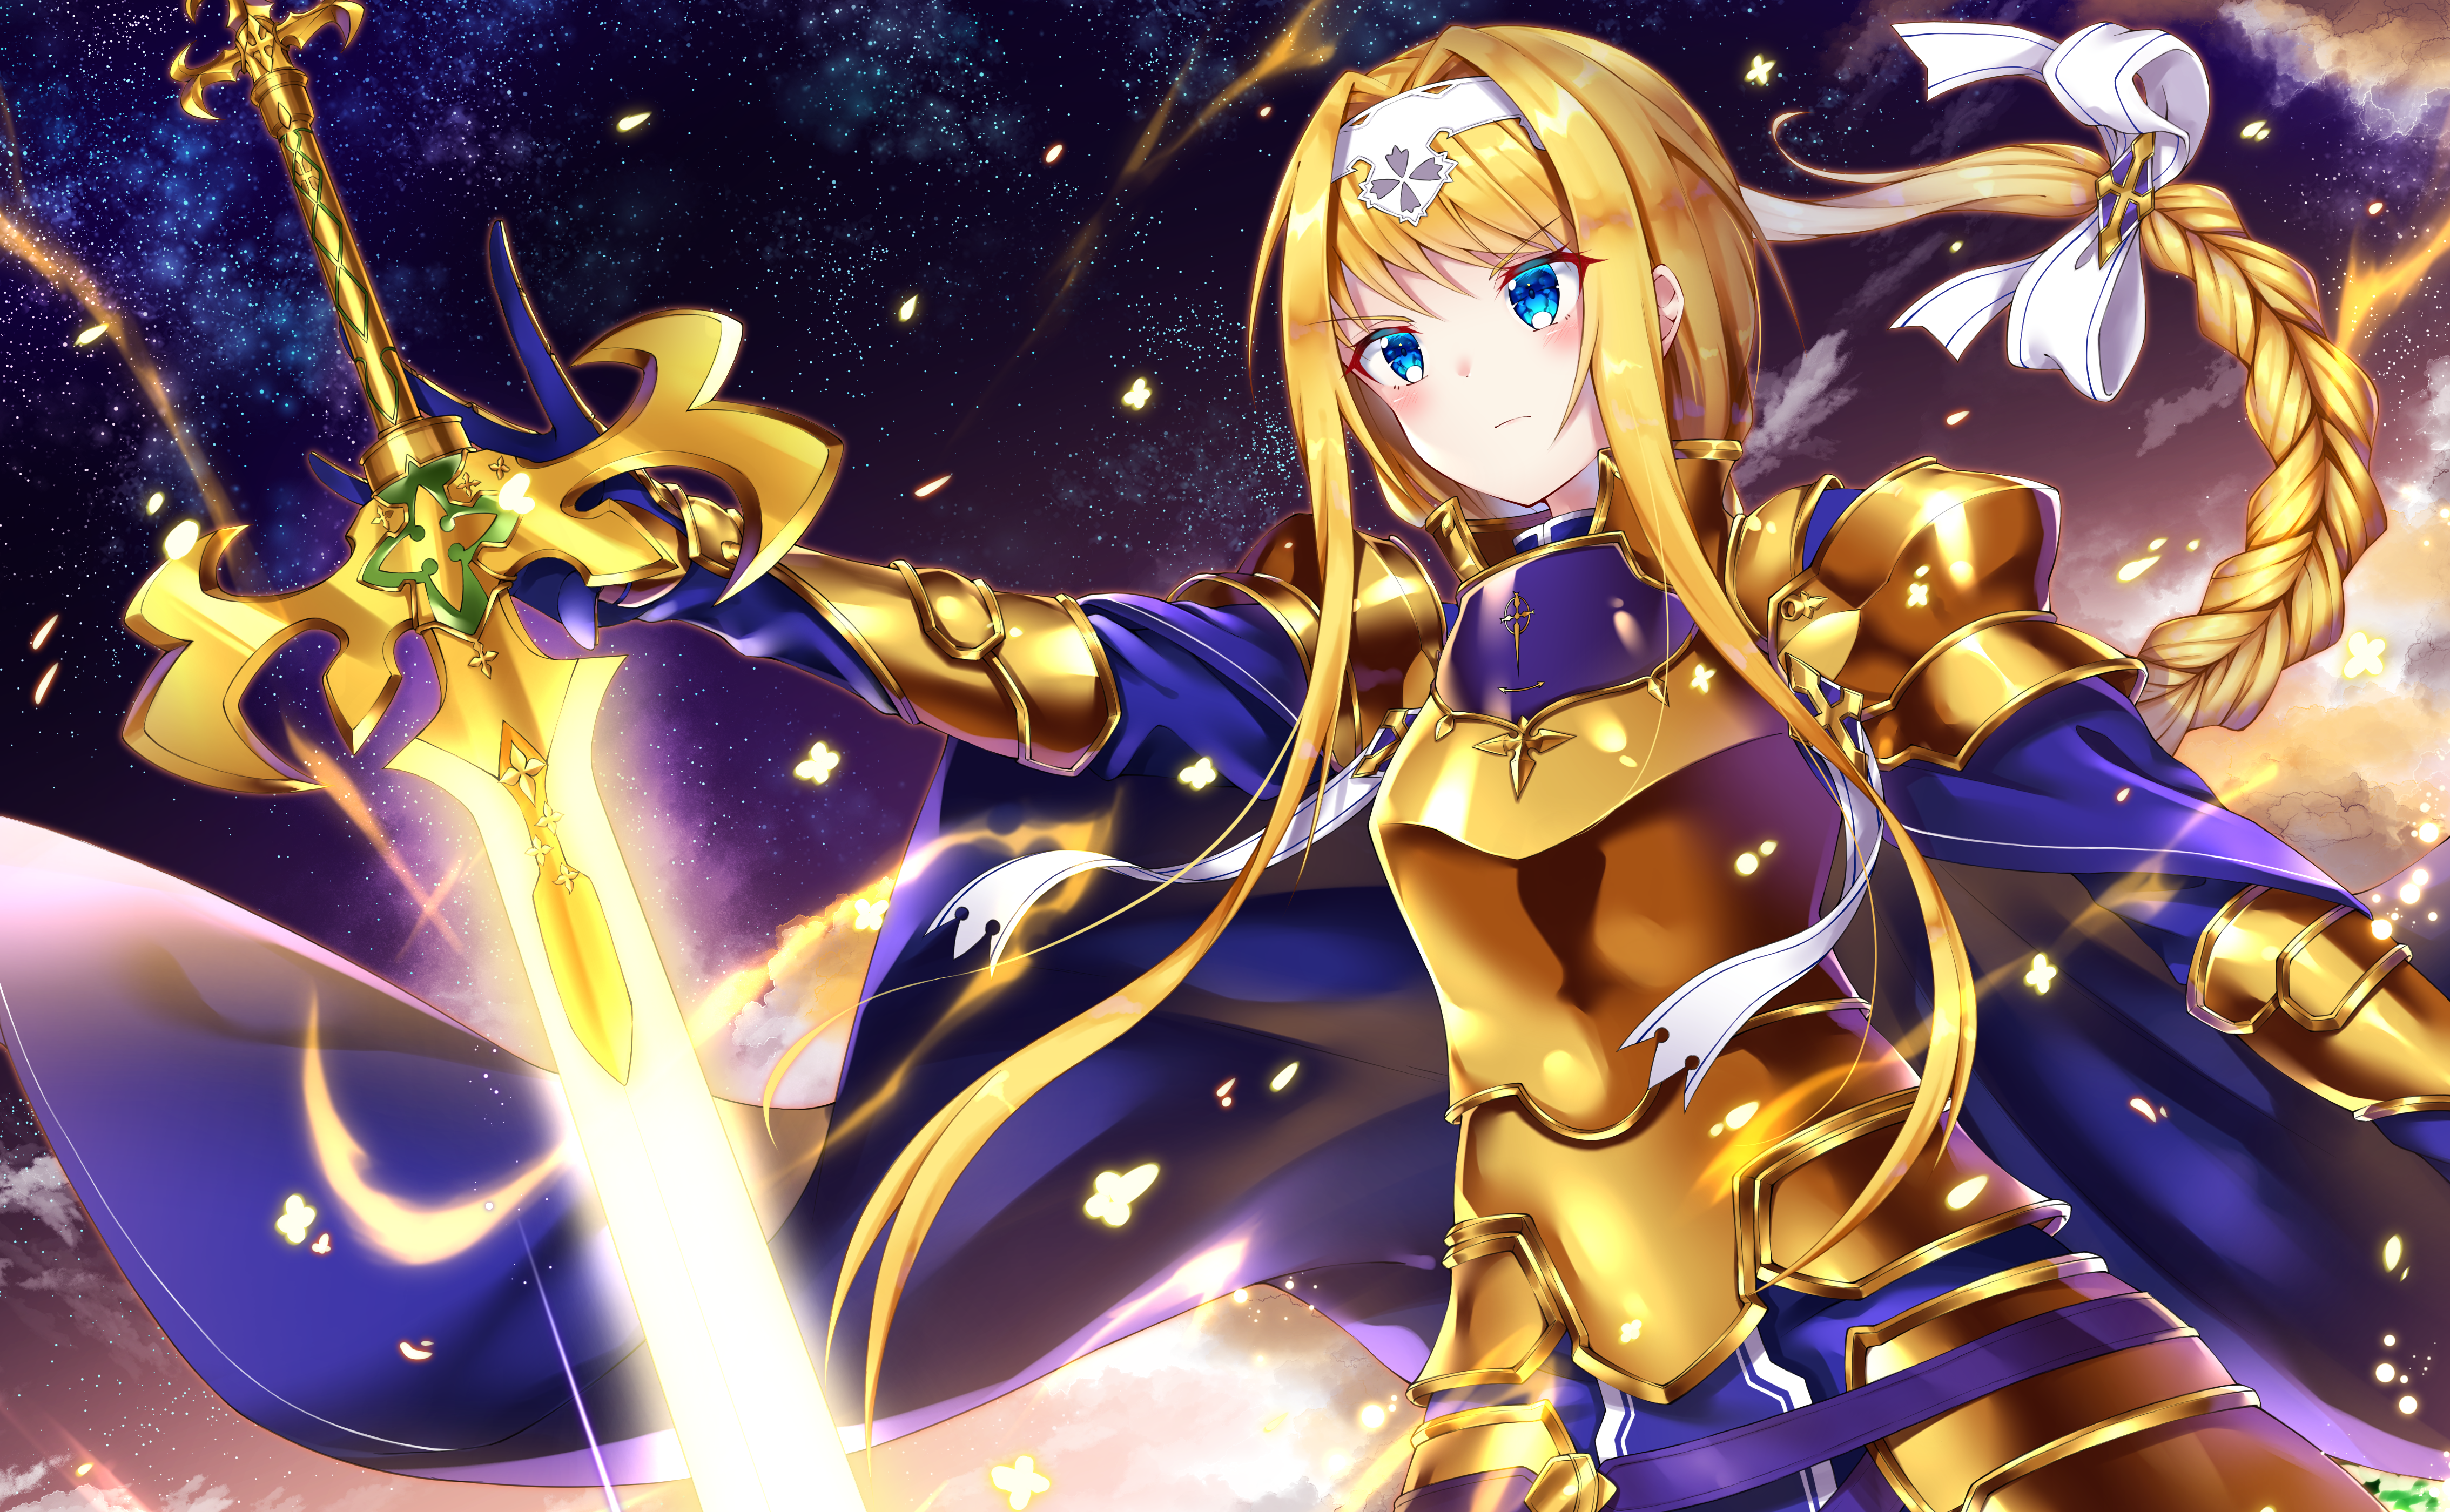 Sword Art Online Alicization 4k Ultra Hd Wallpaper Background